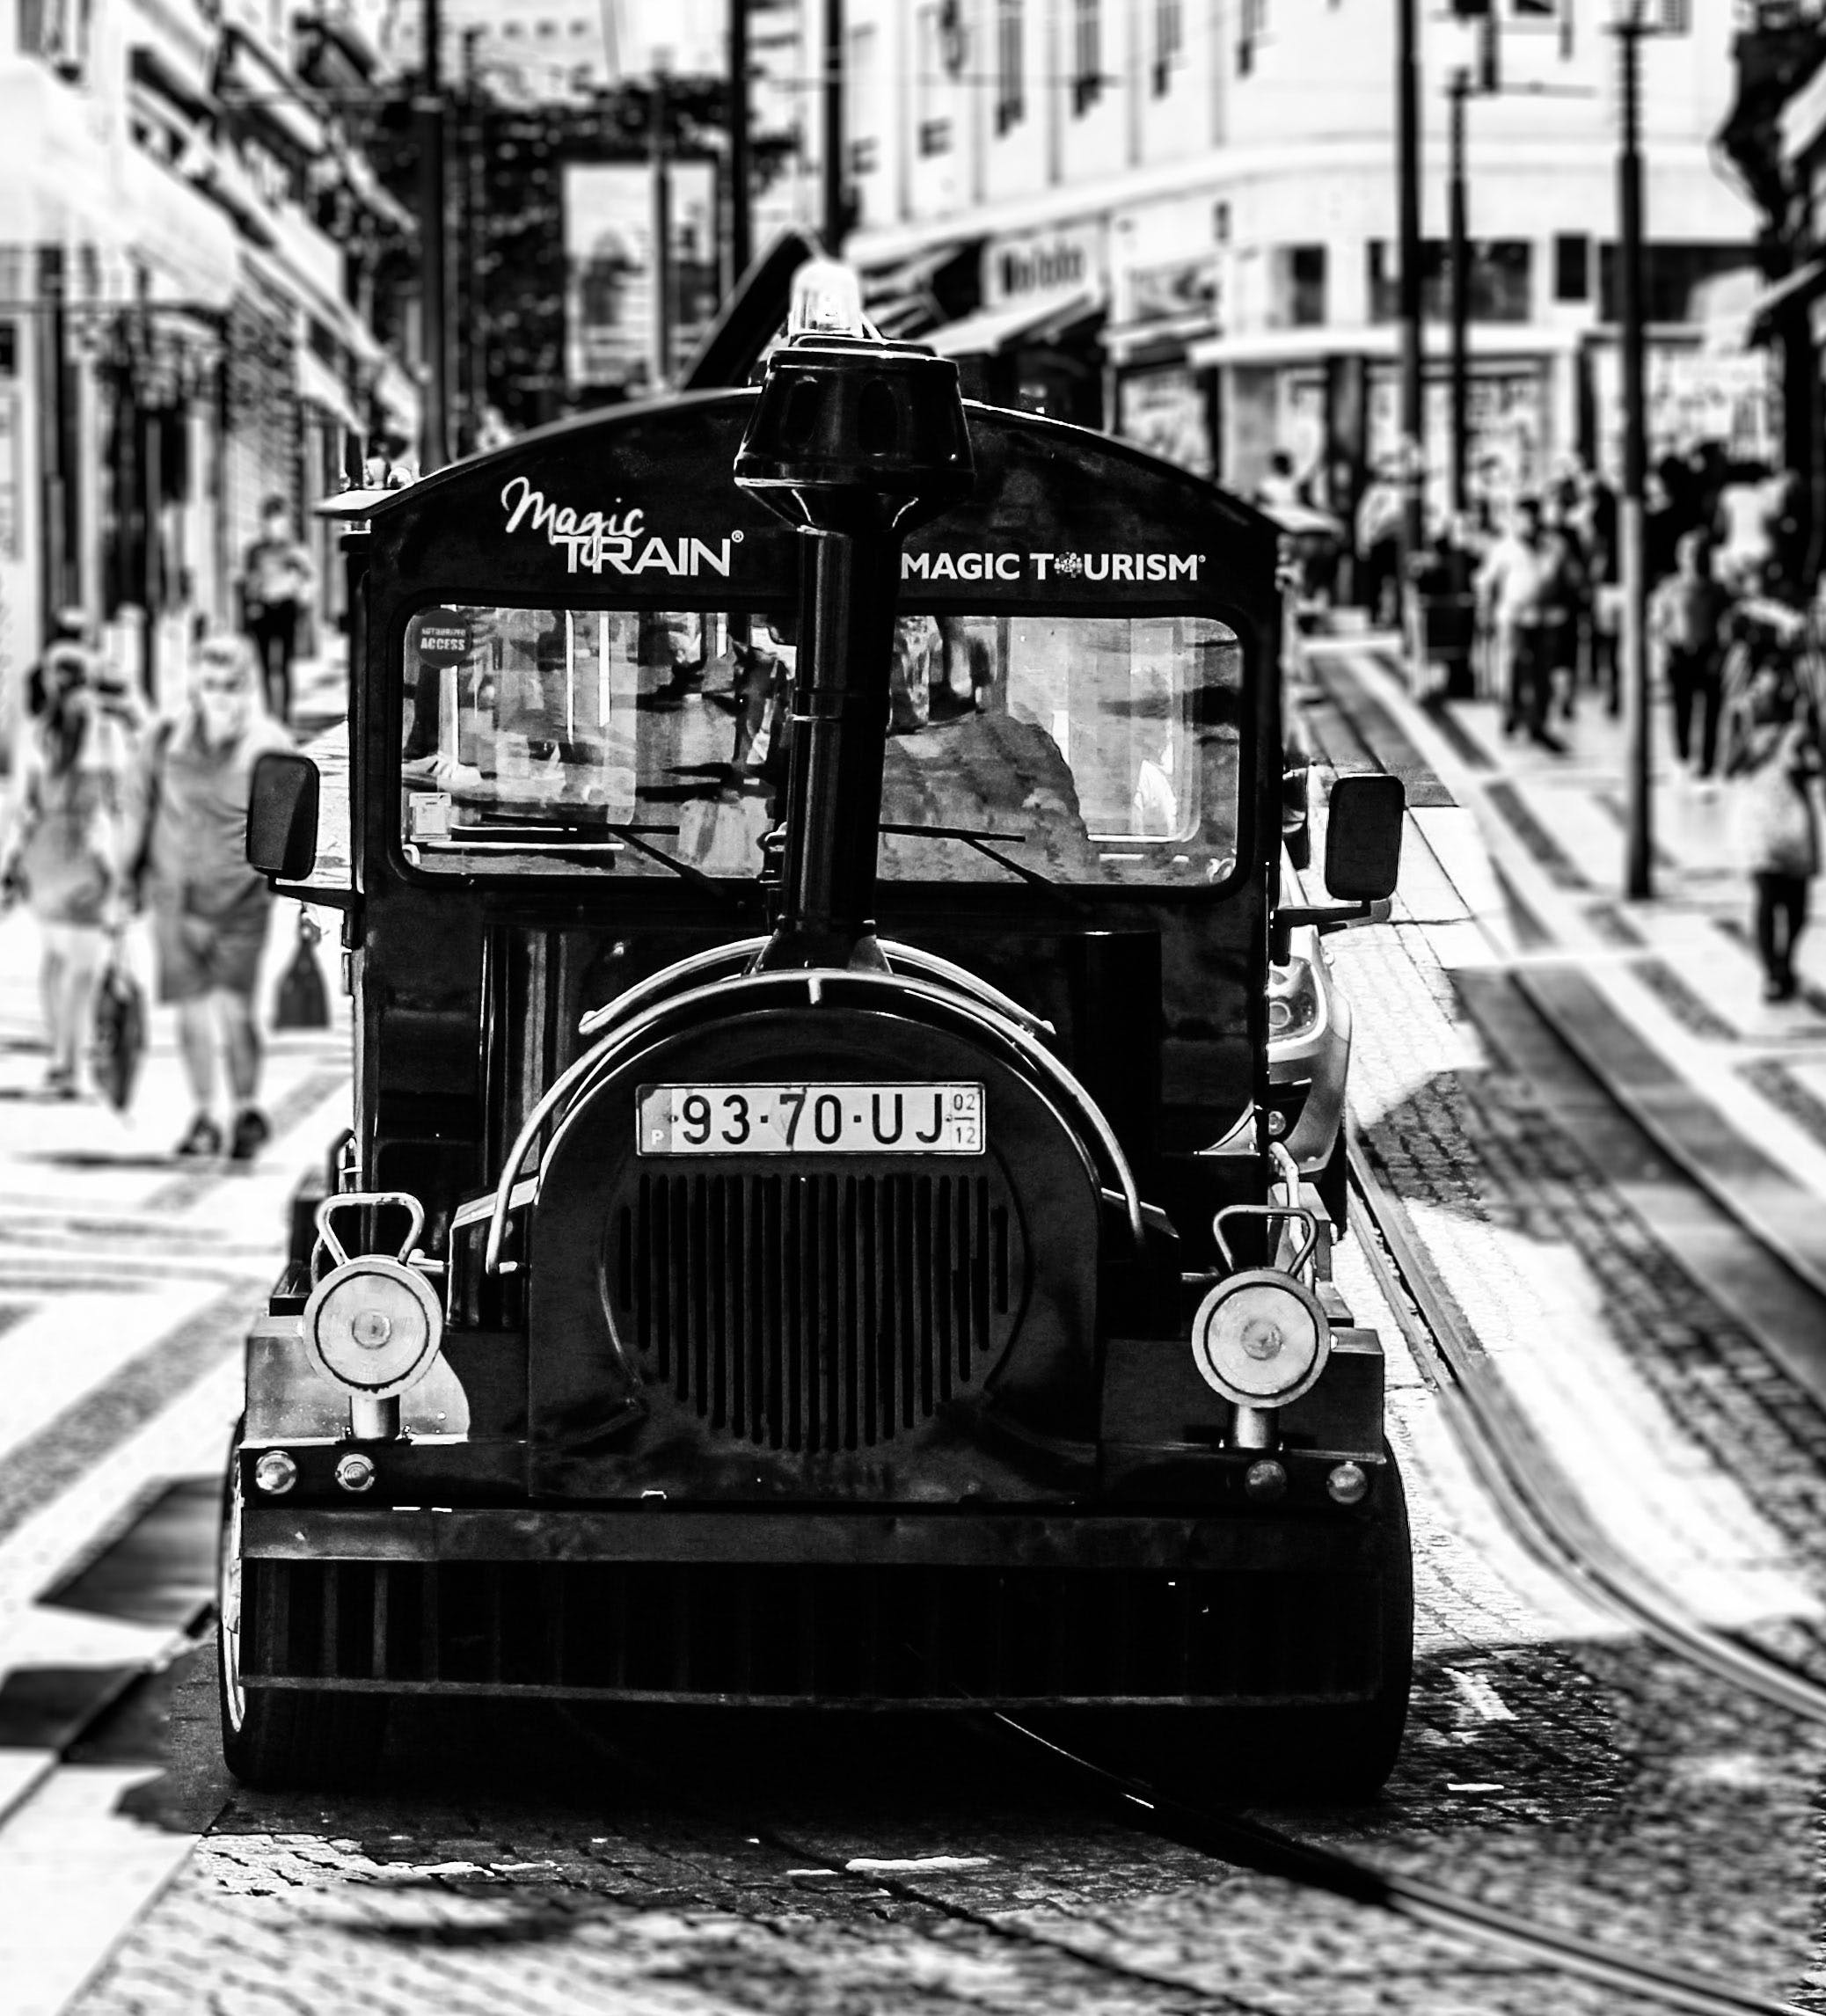 Free stock photo of monochrome, public transport, train, transport